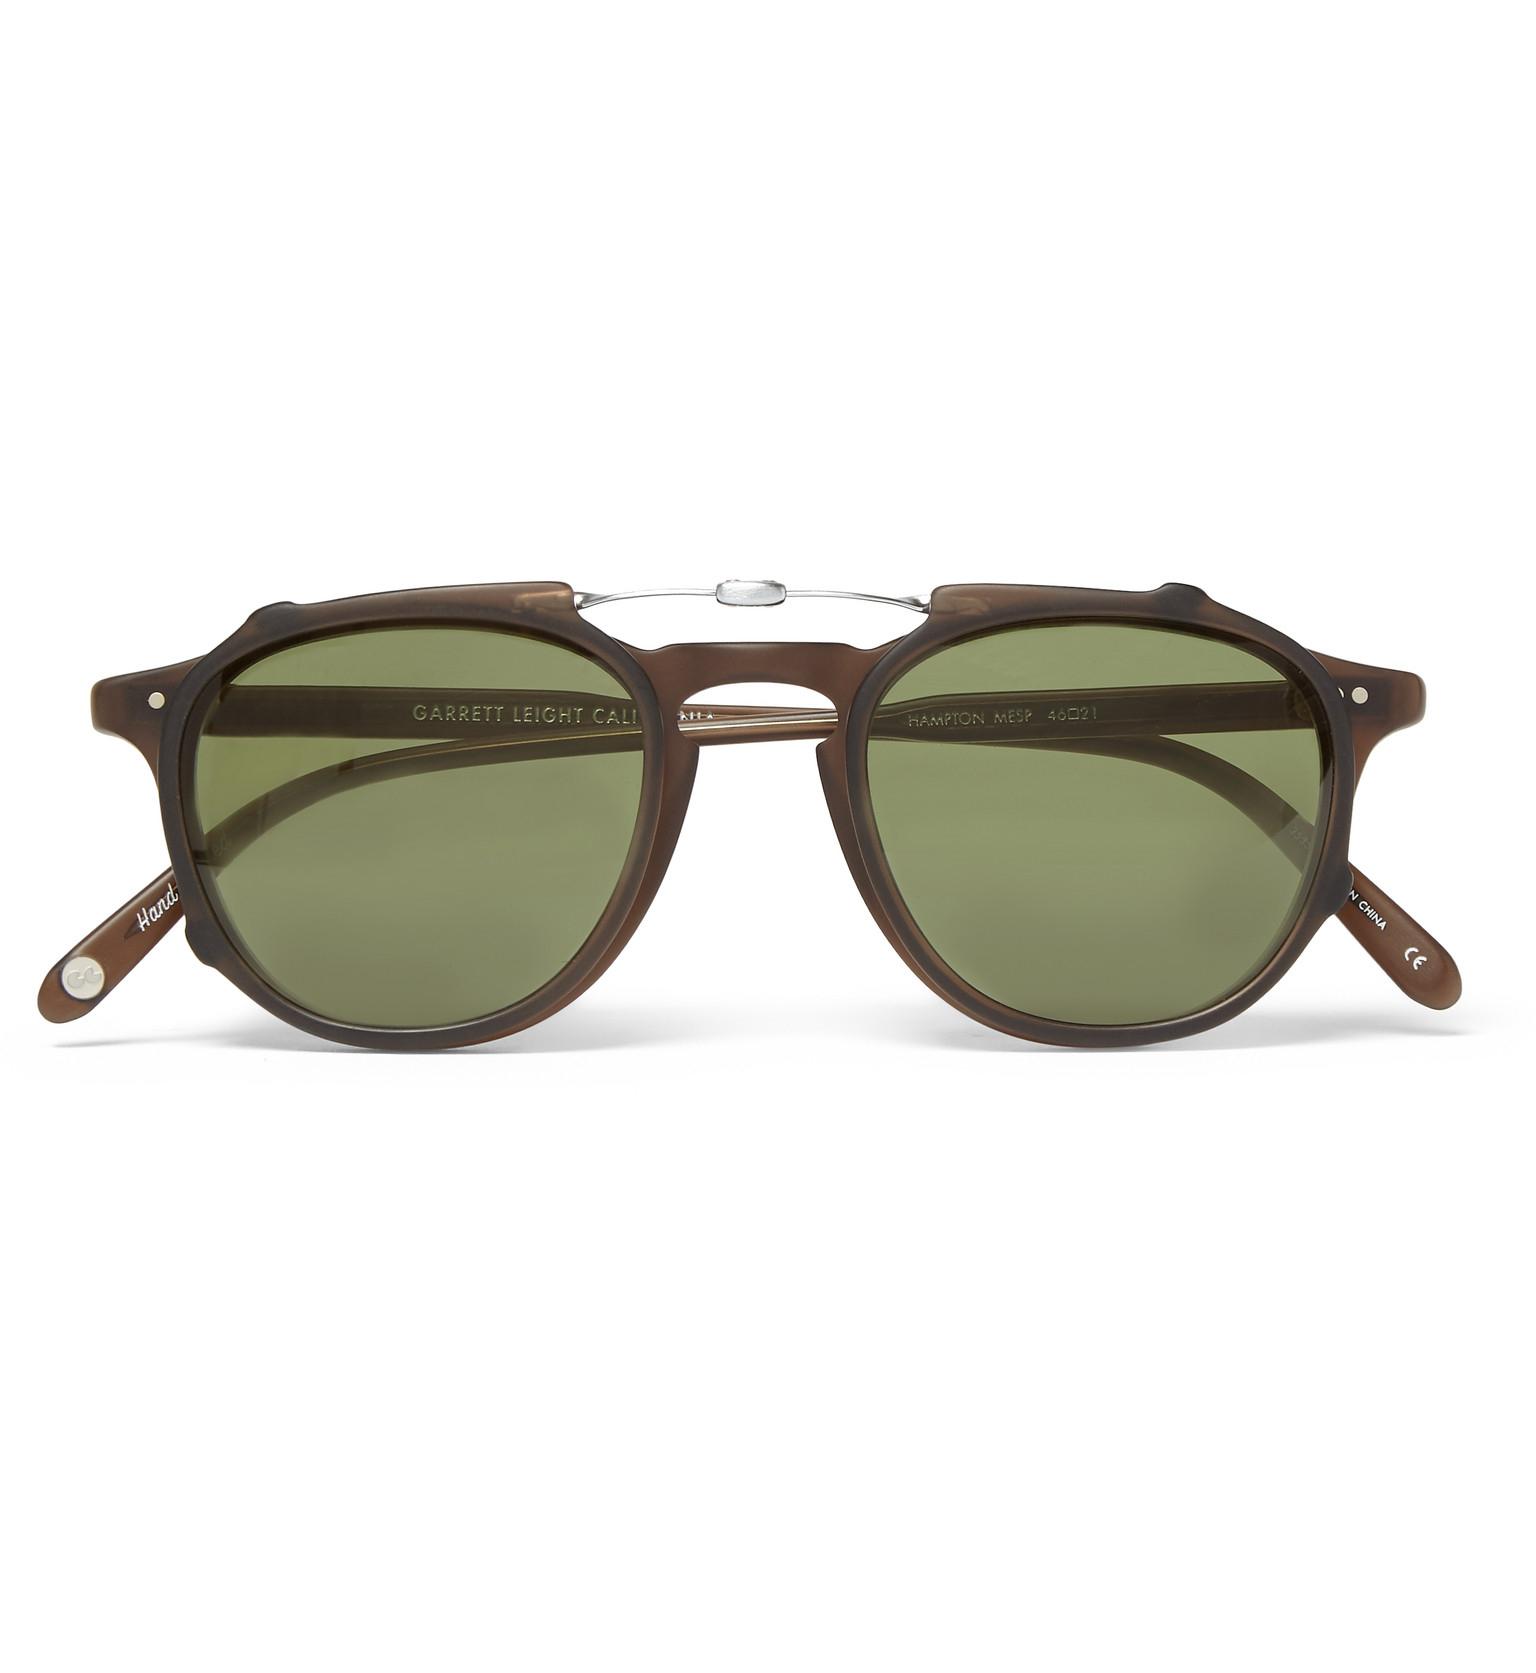 eb8d121994 Garrett Leight California Optical Glasses